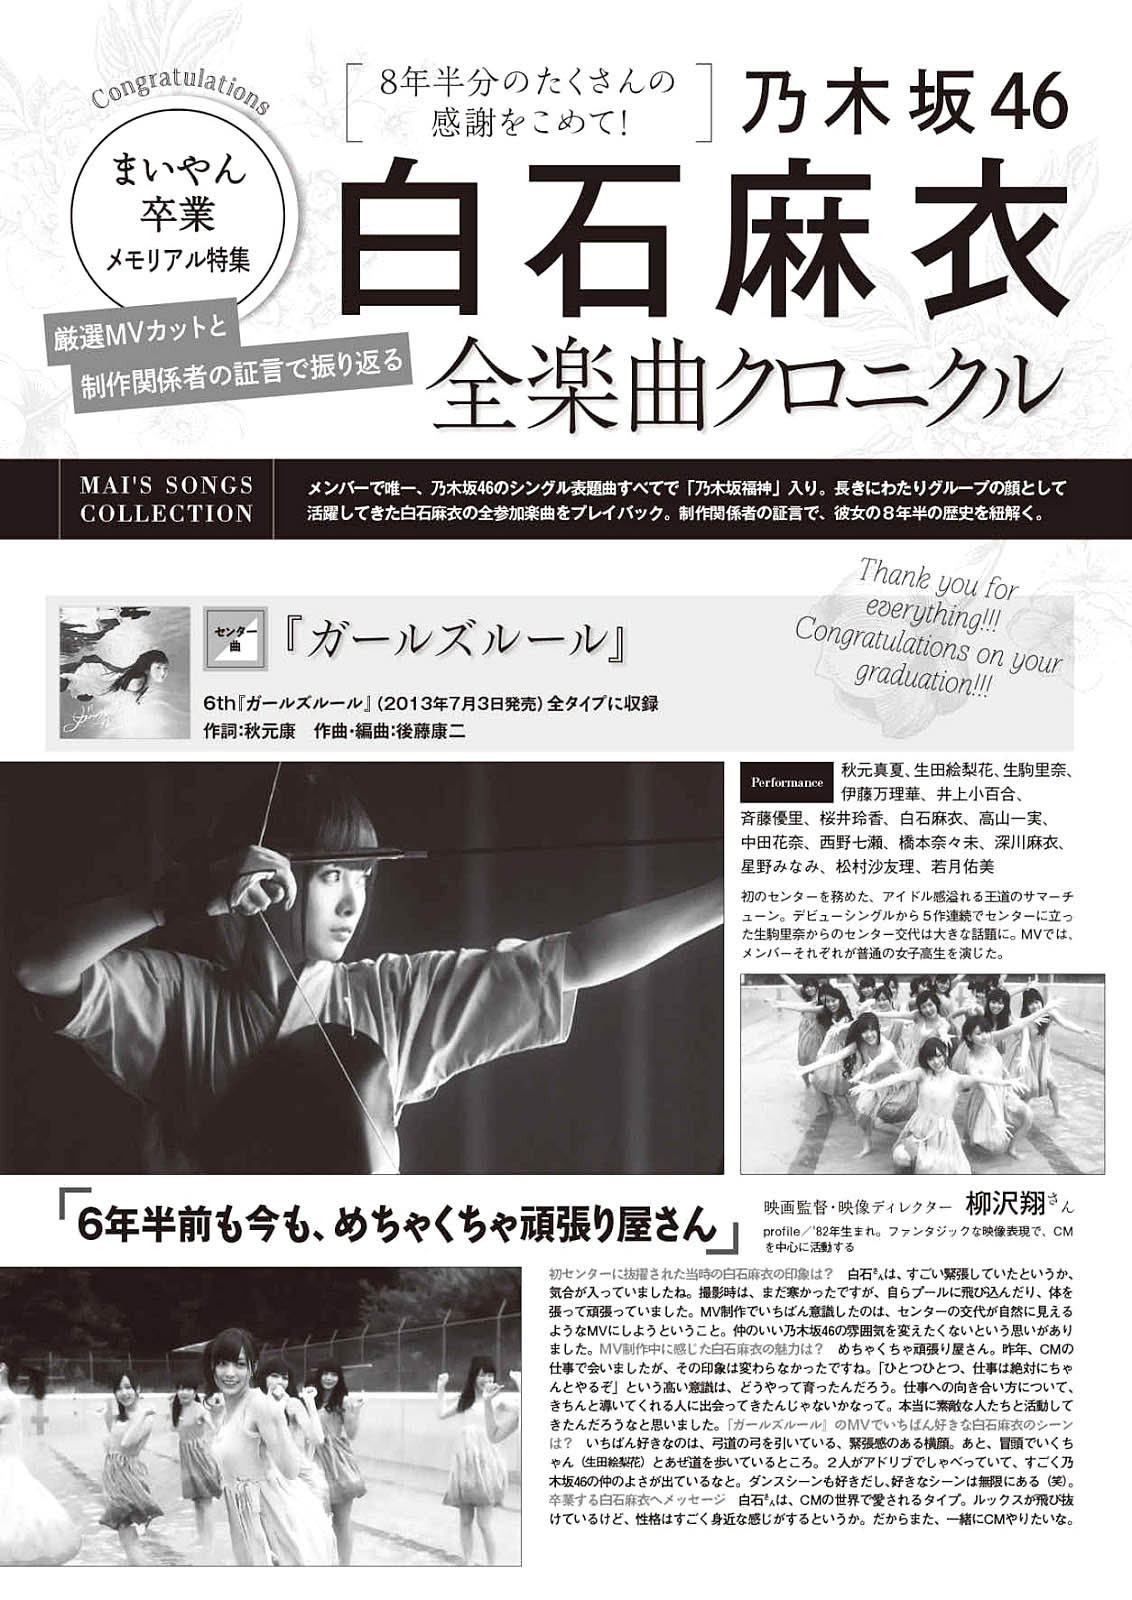 MShiraishi Flash Sp Gravure Best 20 Early Spring 06.jpg